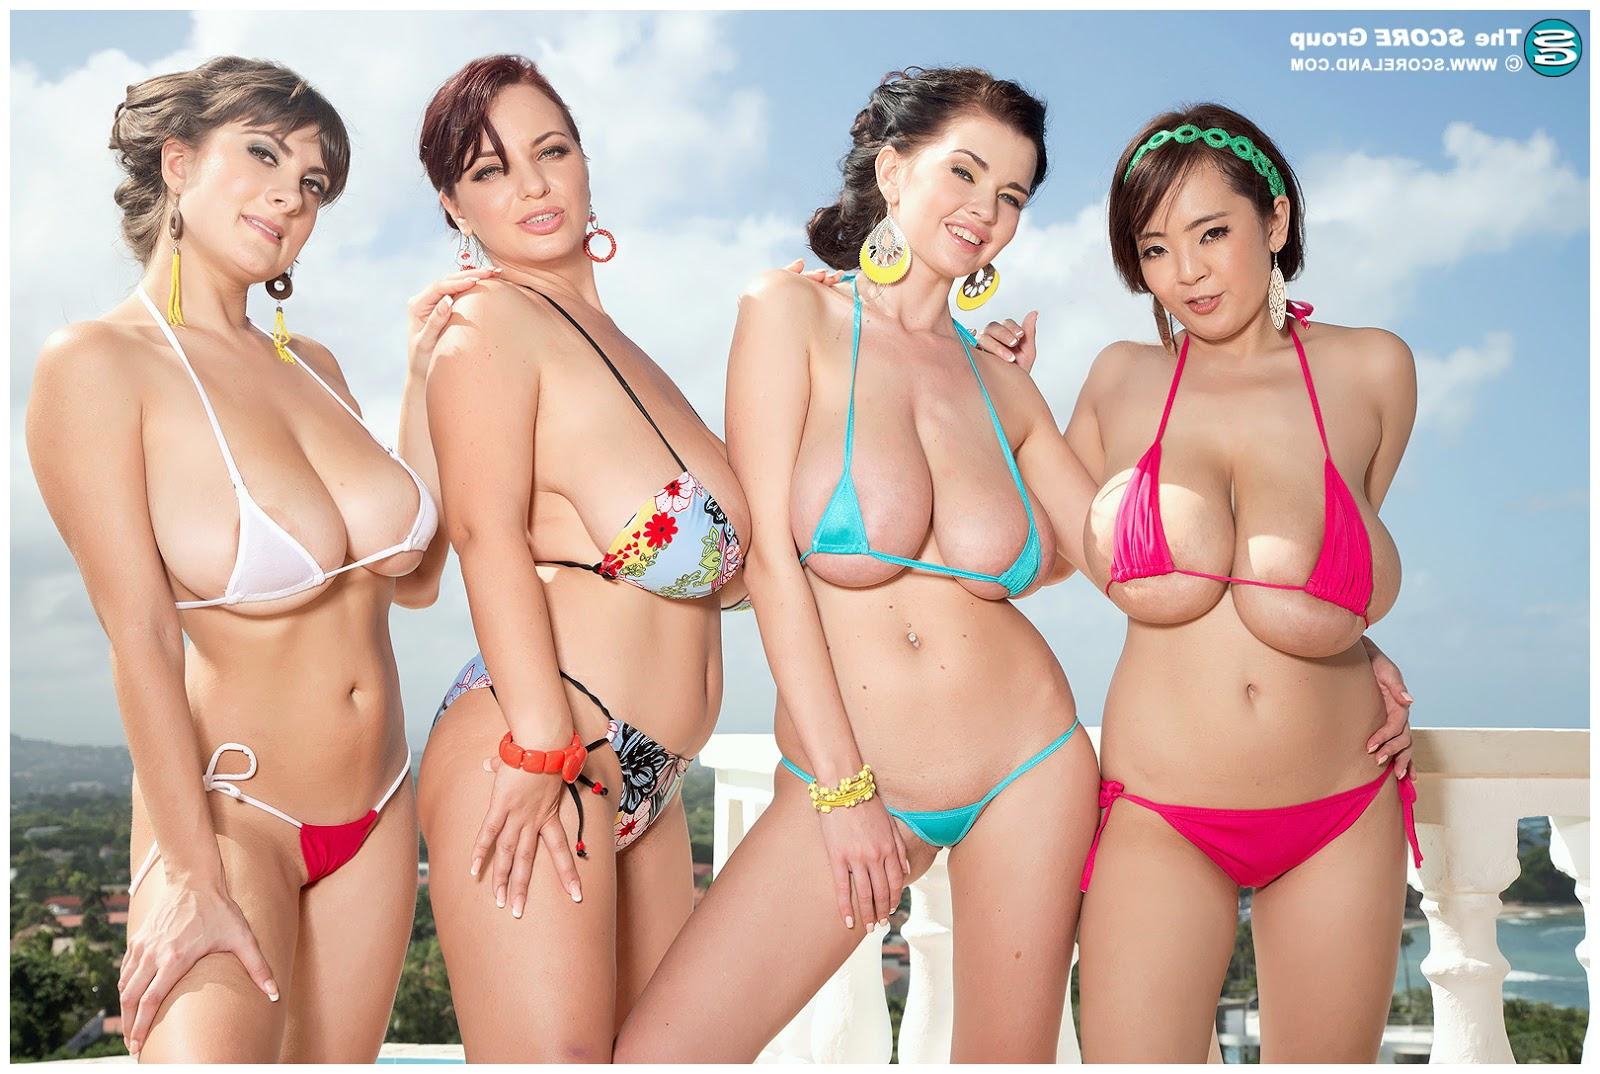 The Hitomi tanaka bikini porn